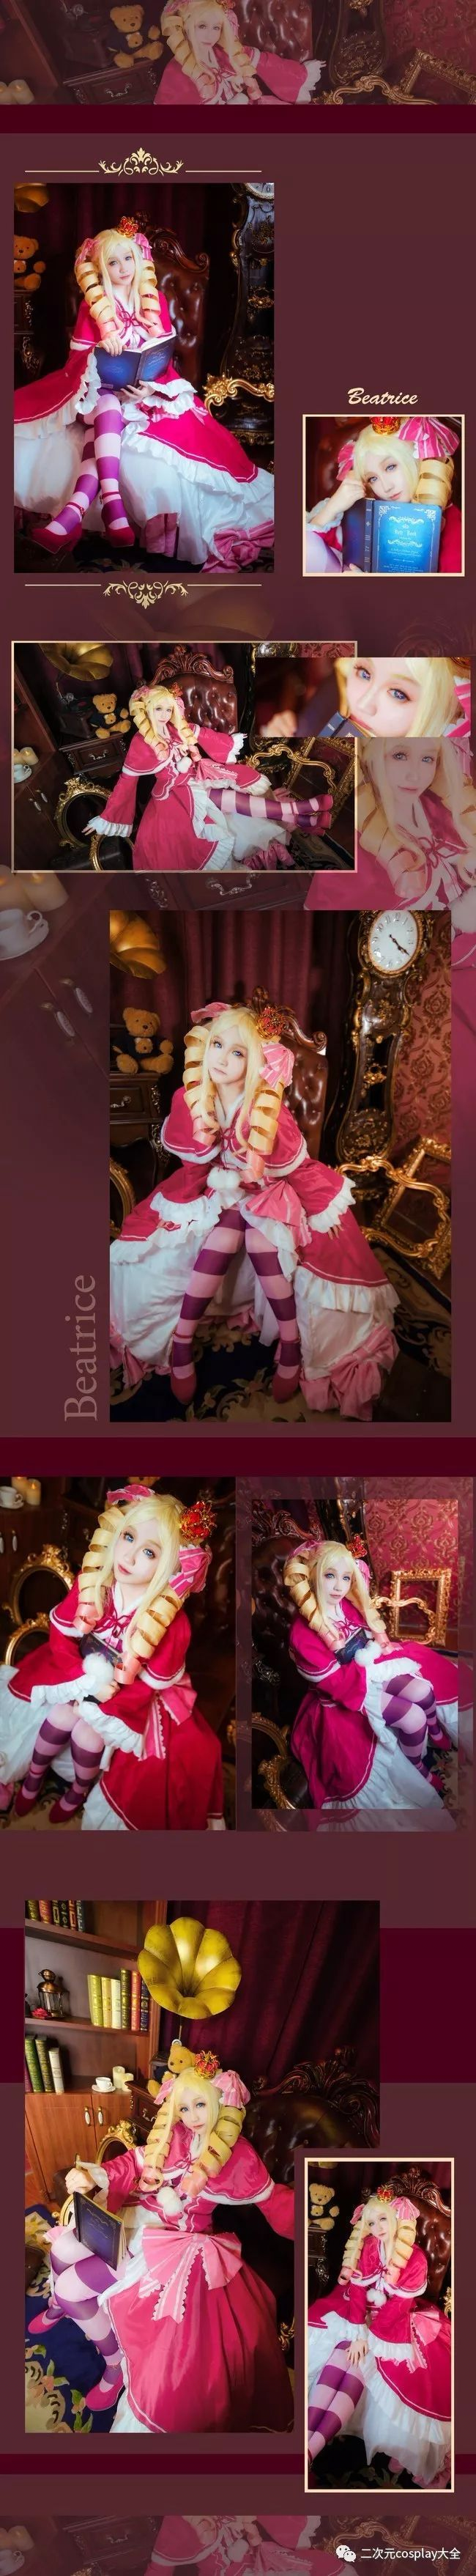 《Re:從零開始的異世界生活》碧翠絲,雙馬尾小可愛,好像洋娃娃哇!